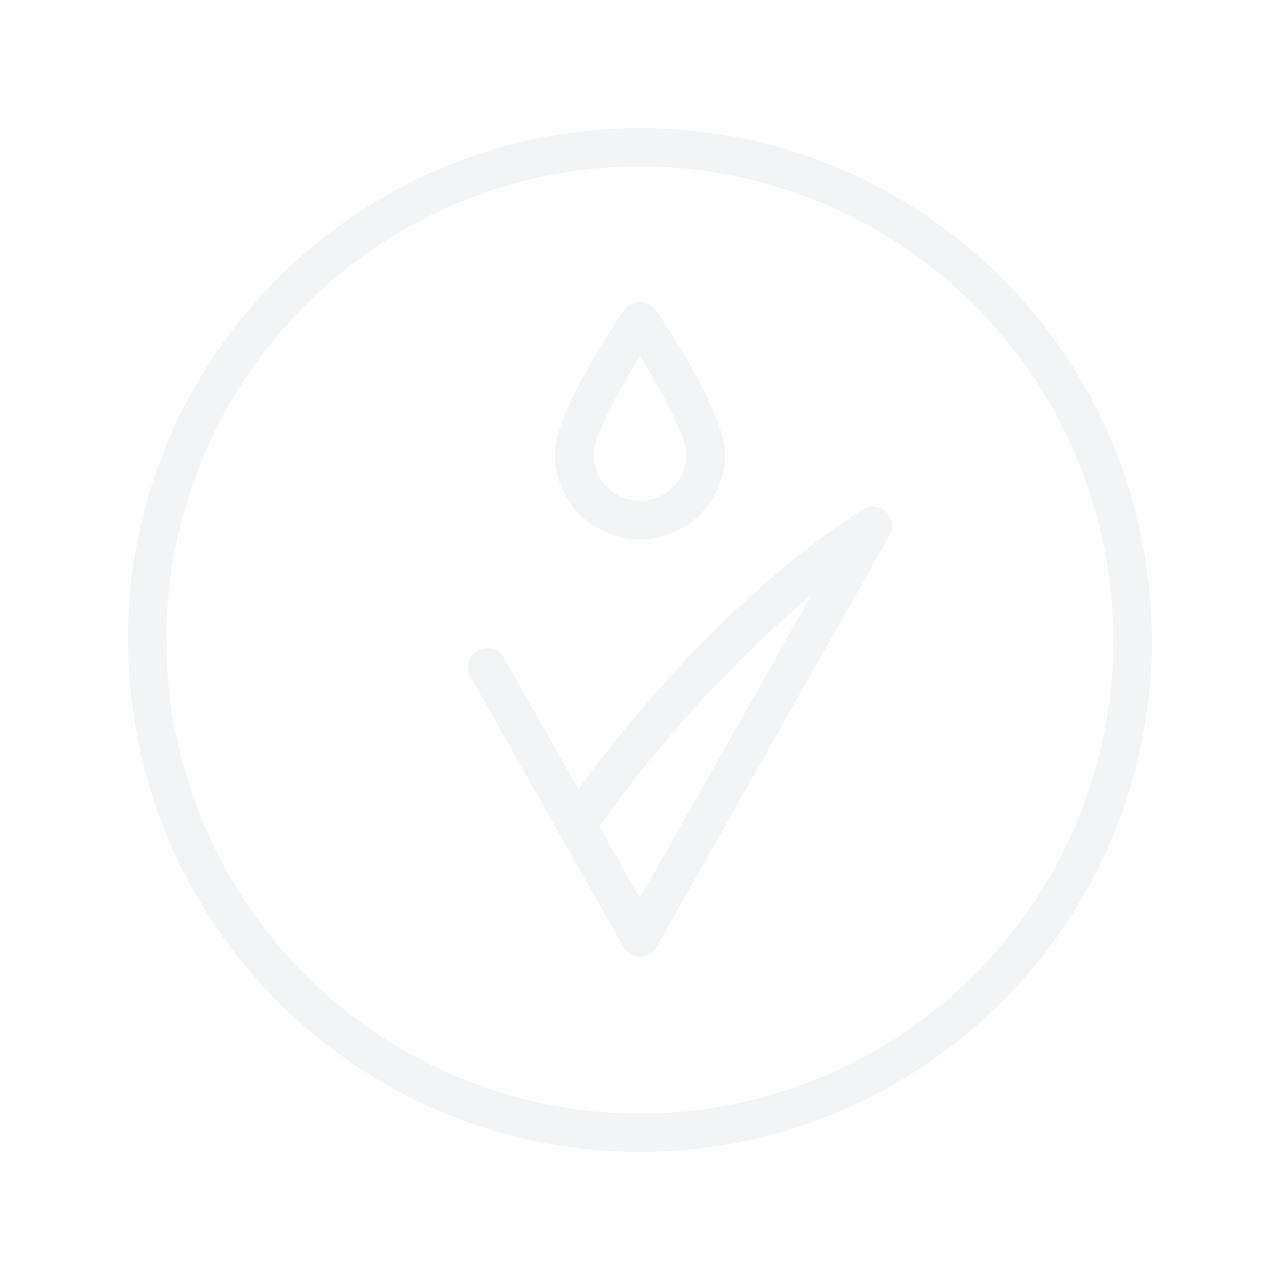 MADARA Bio-Active Roll-On Deodorant 50ml